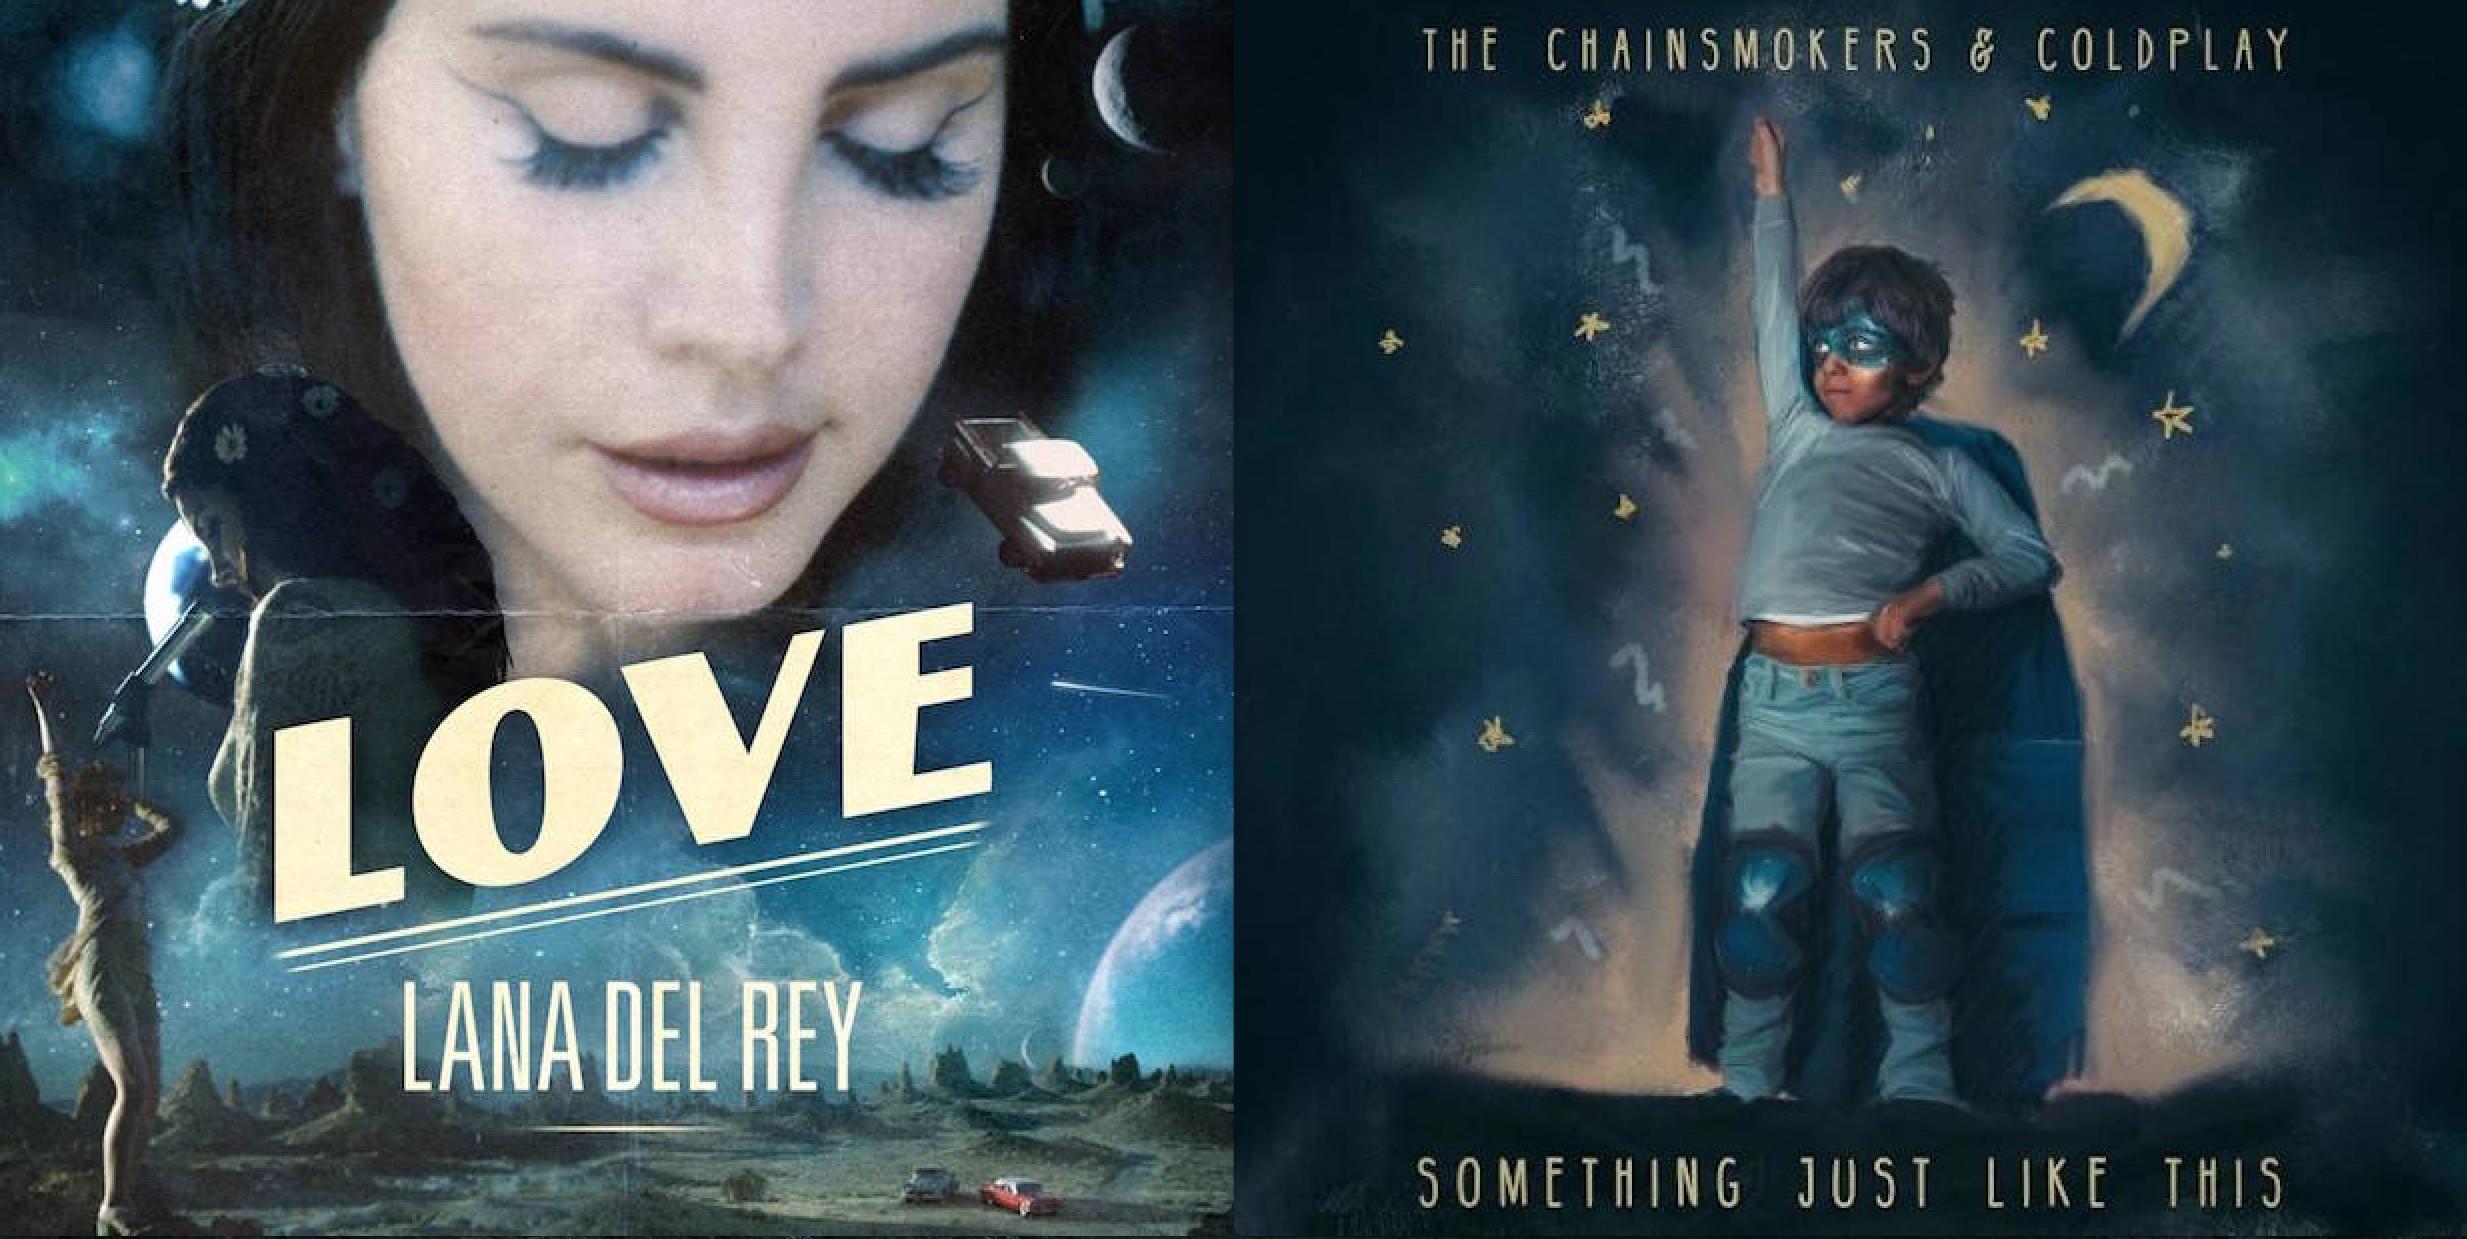 Lana Chainsmokers Coldplay